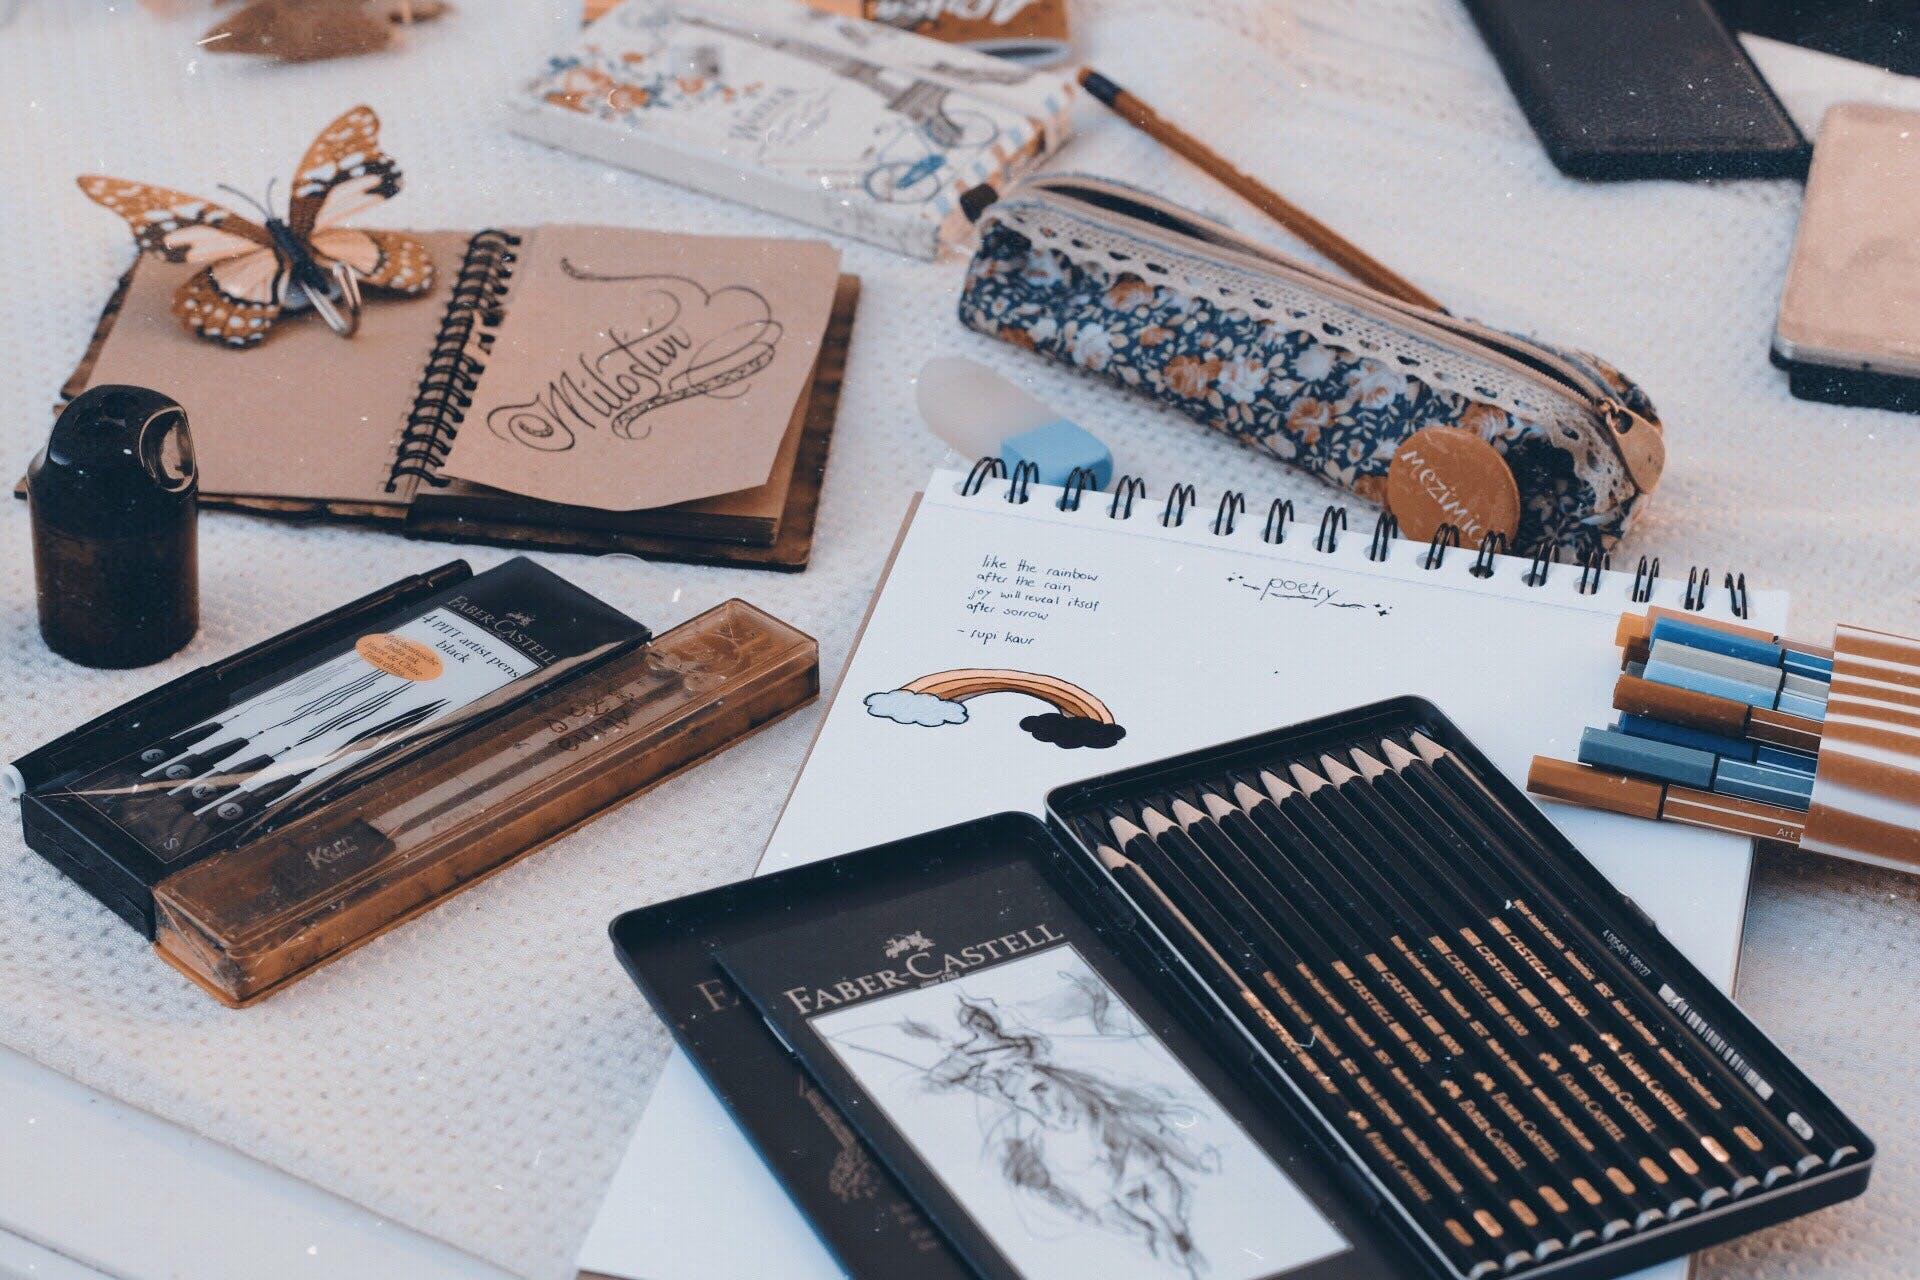 Black Faber Castell Coloring Pens Inside Box